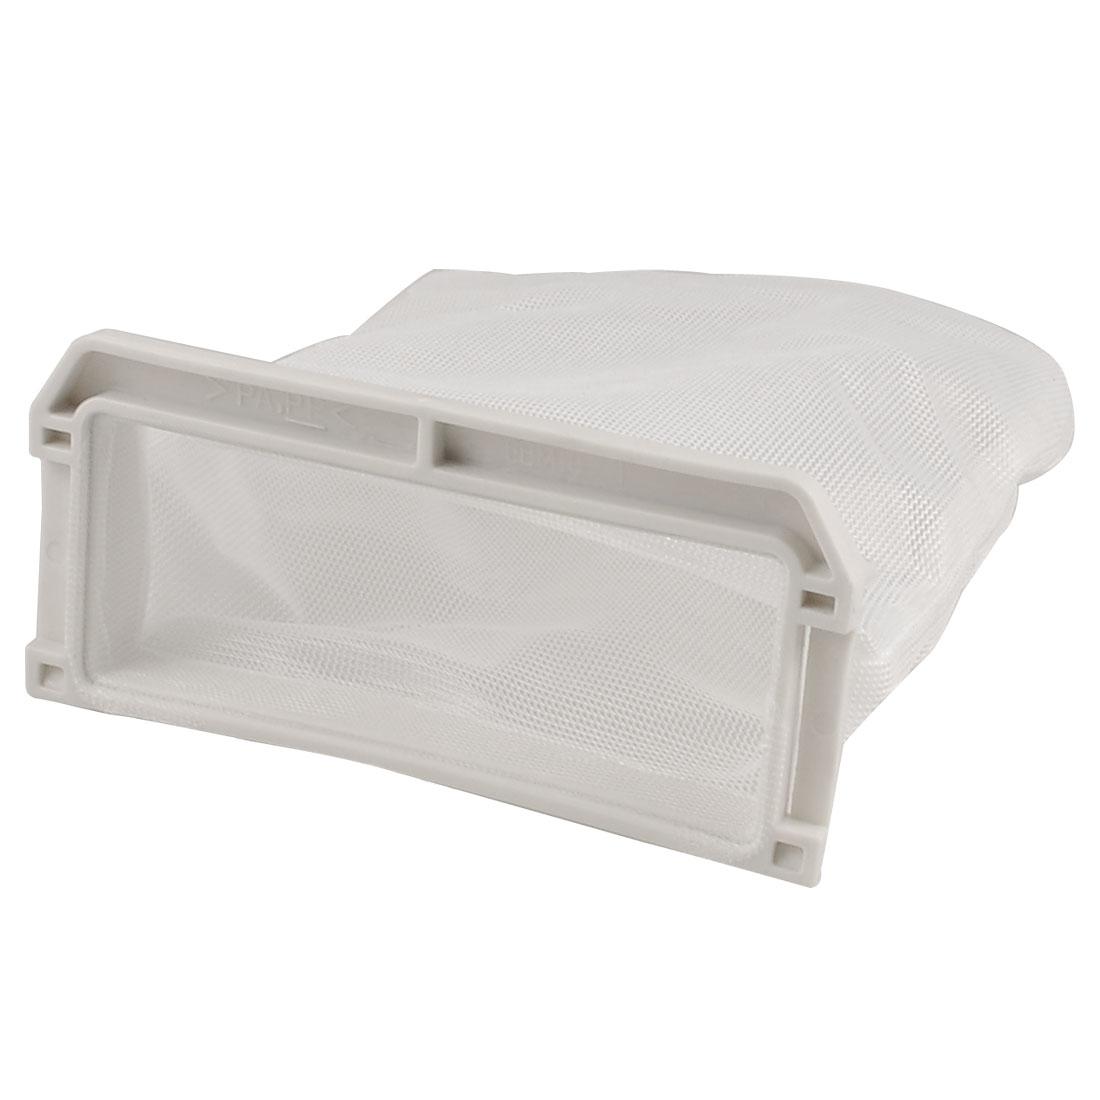 Washing Machine White Plastic Nylon Filter 11cm x 13cm Meshy Bag